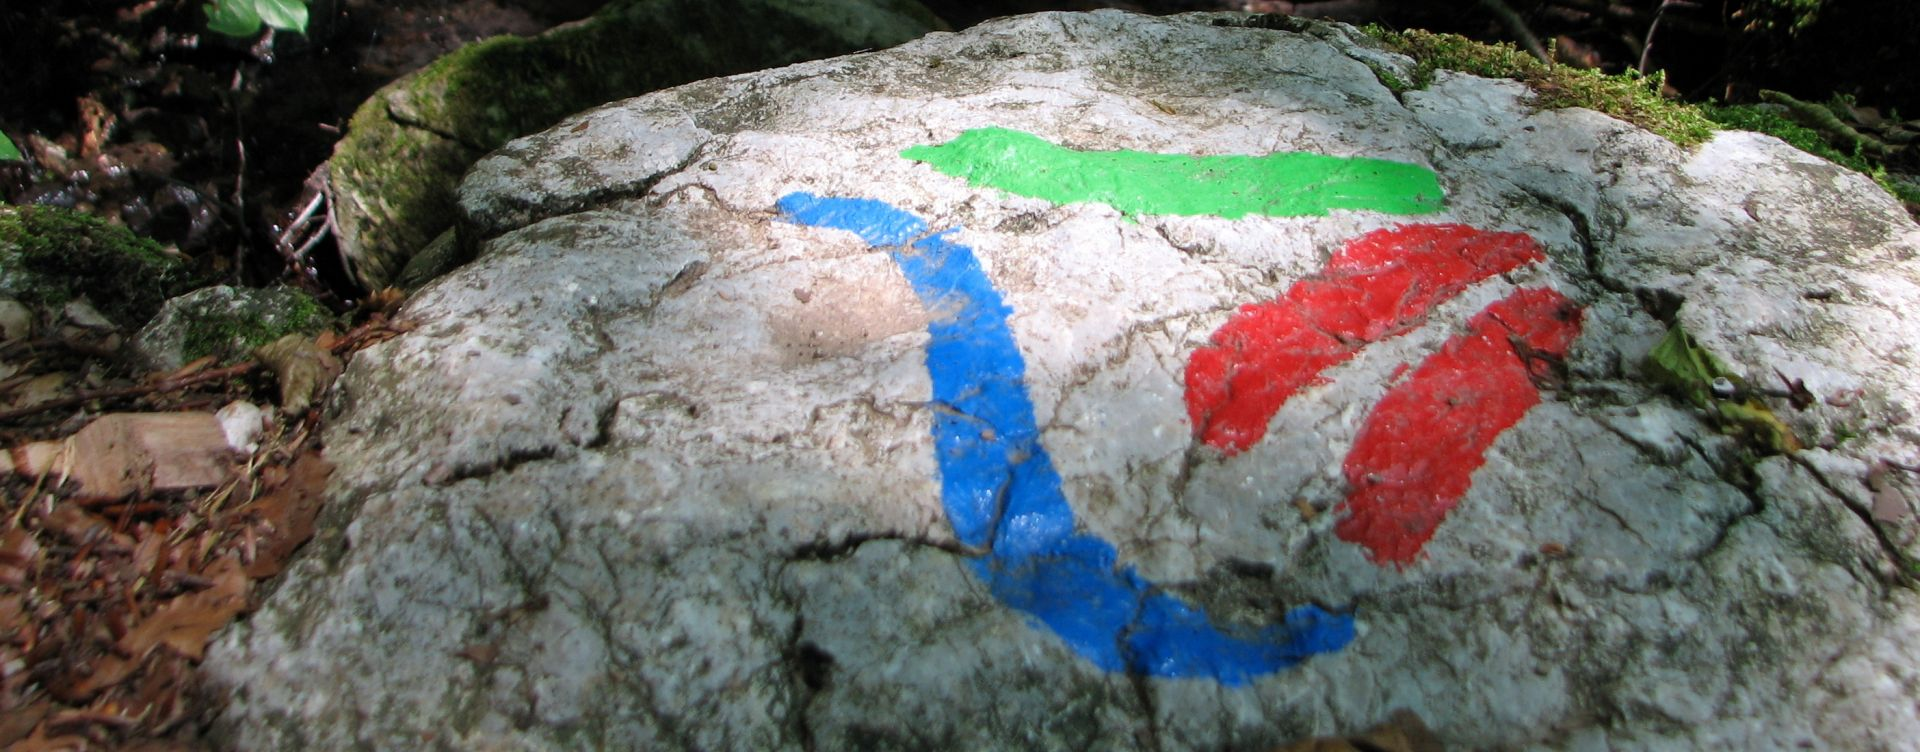 Alpe Adria Trail Slovenia